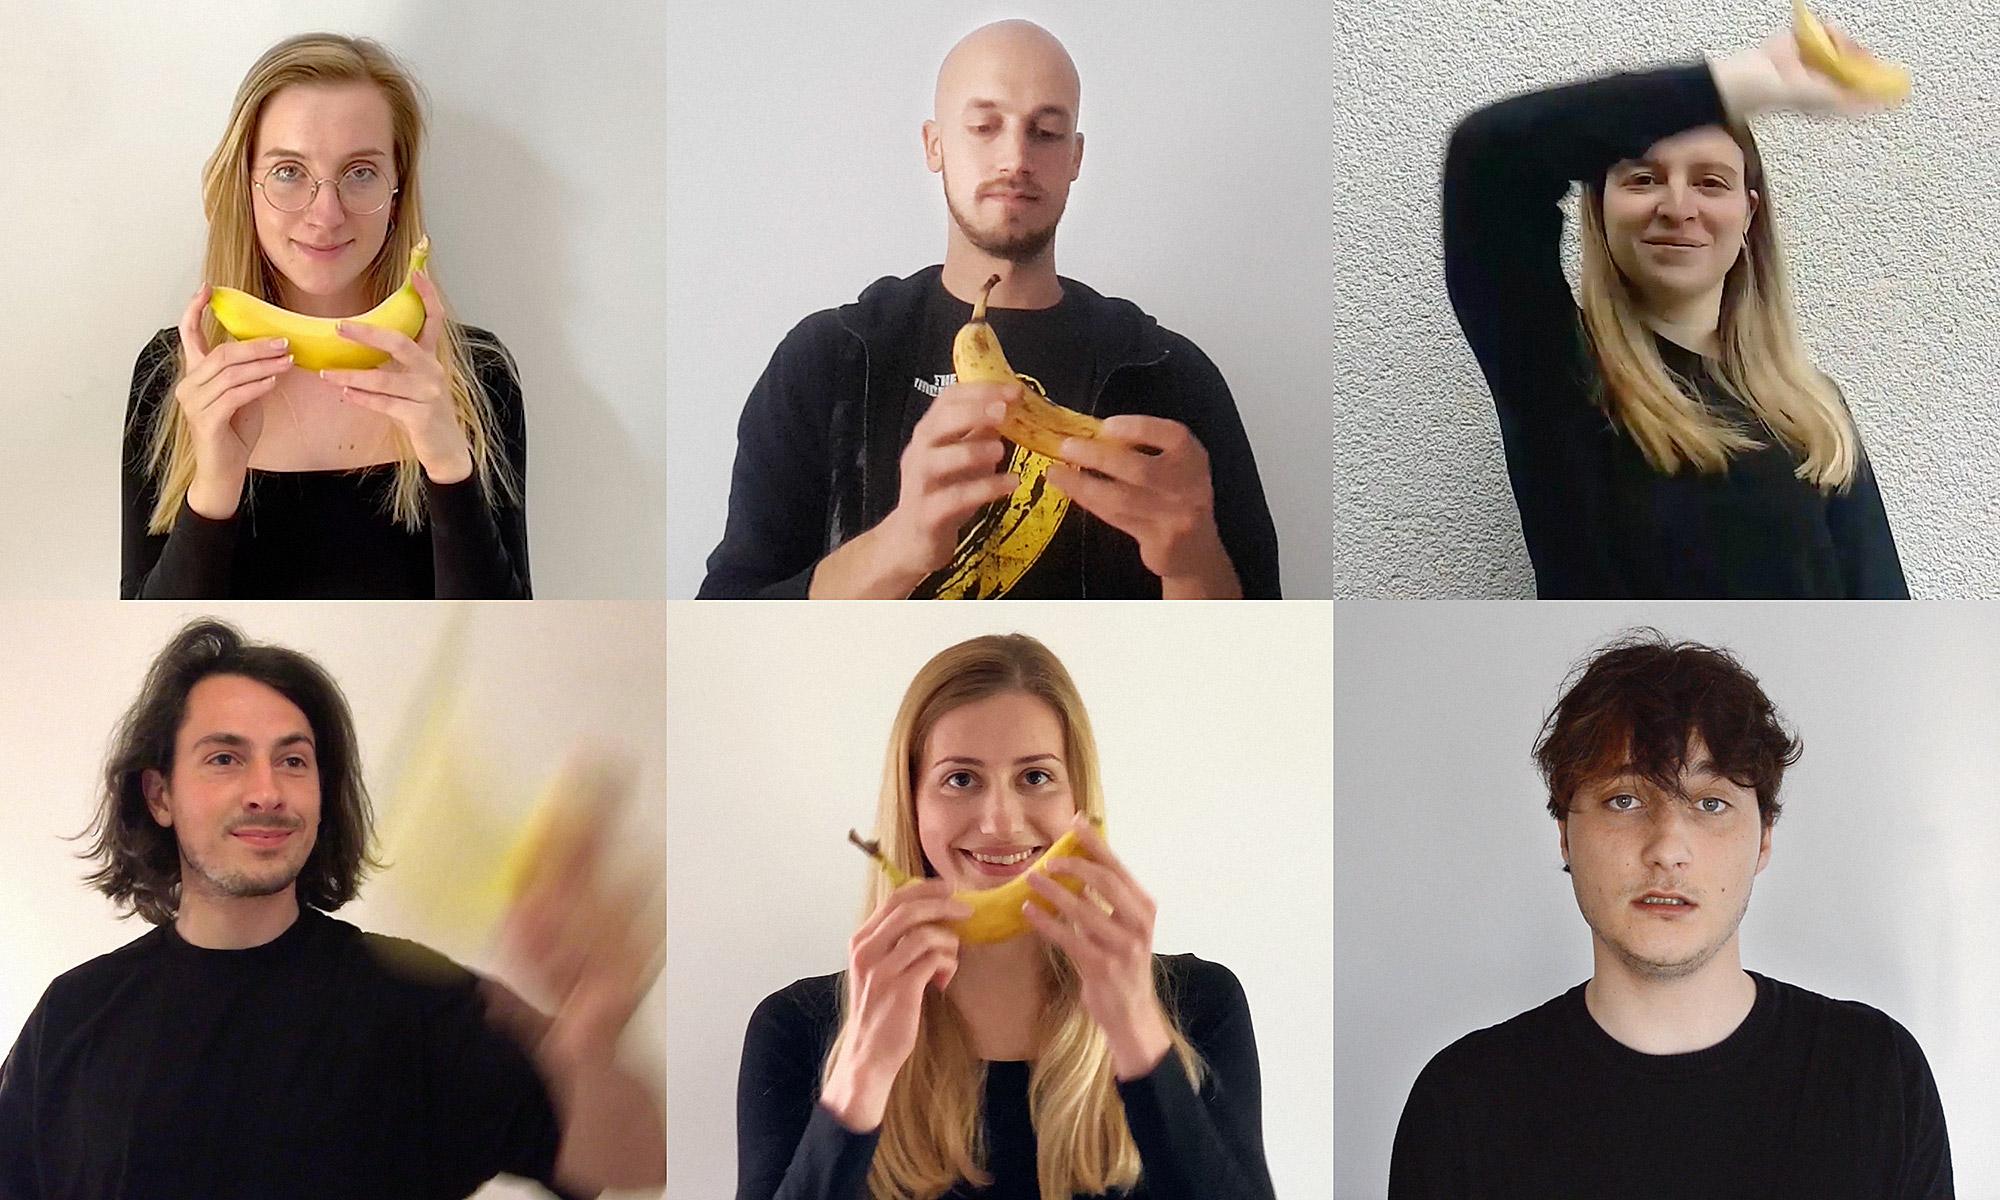 Team Bulky Bananas